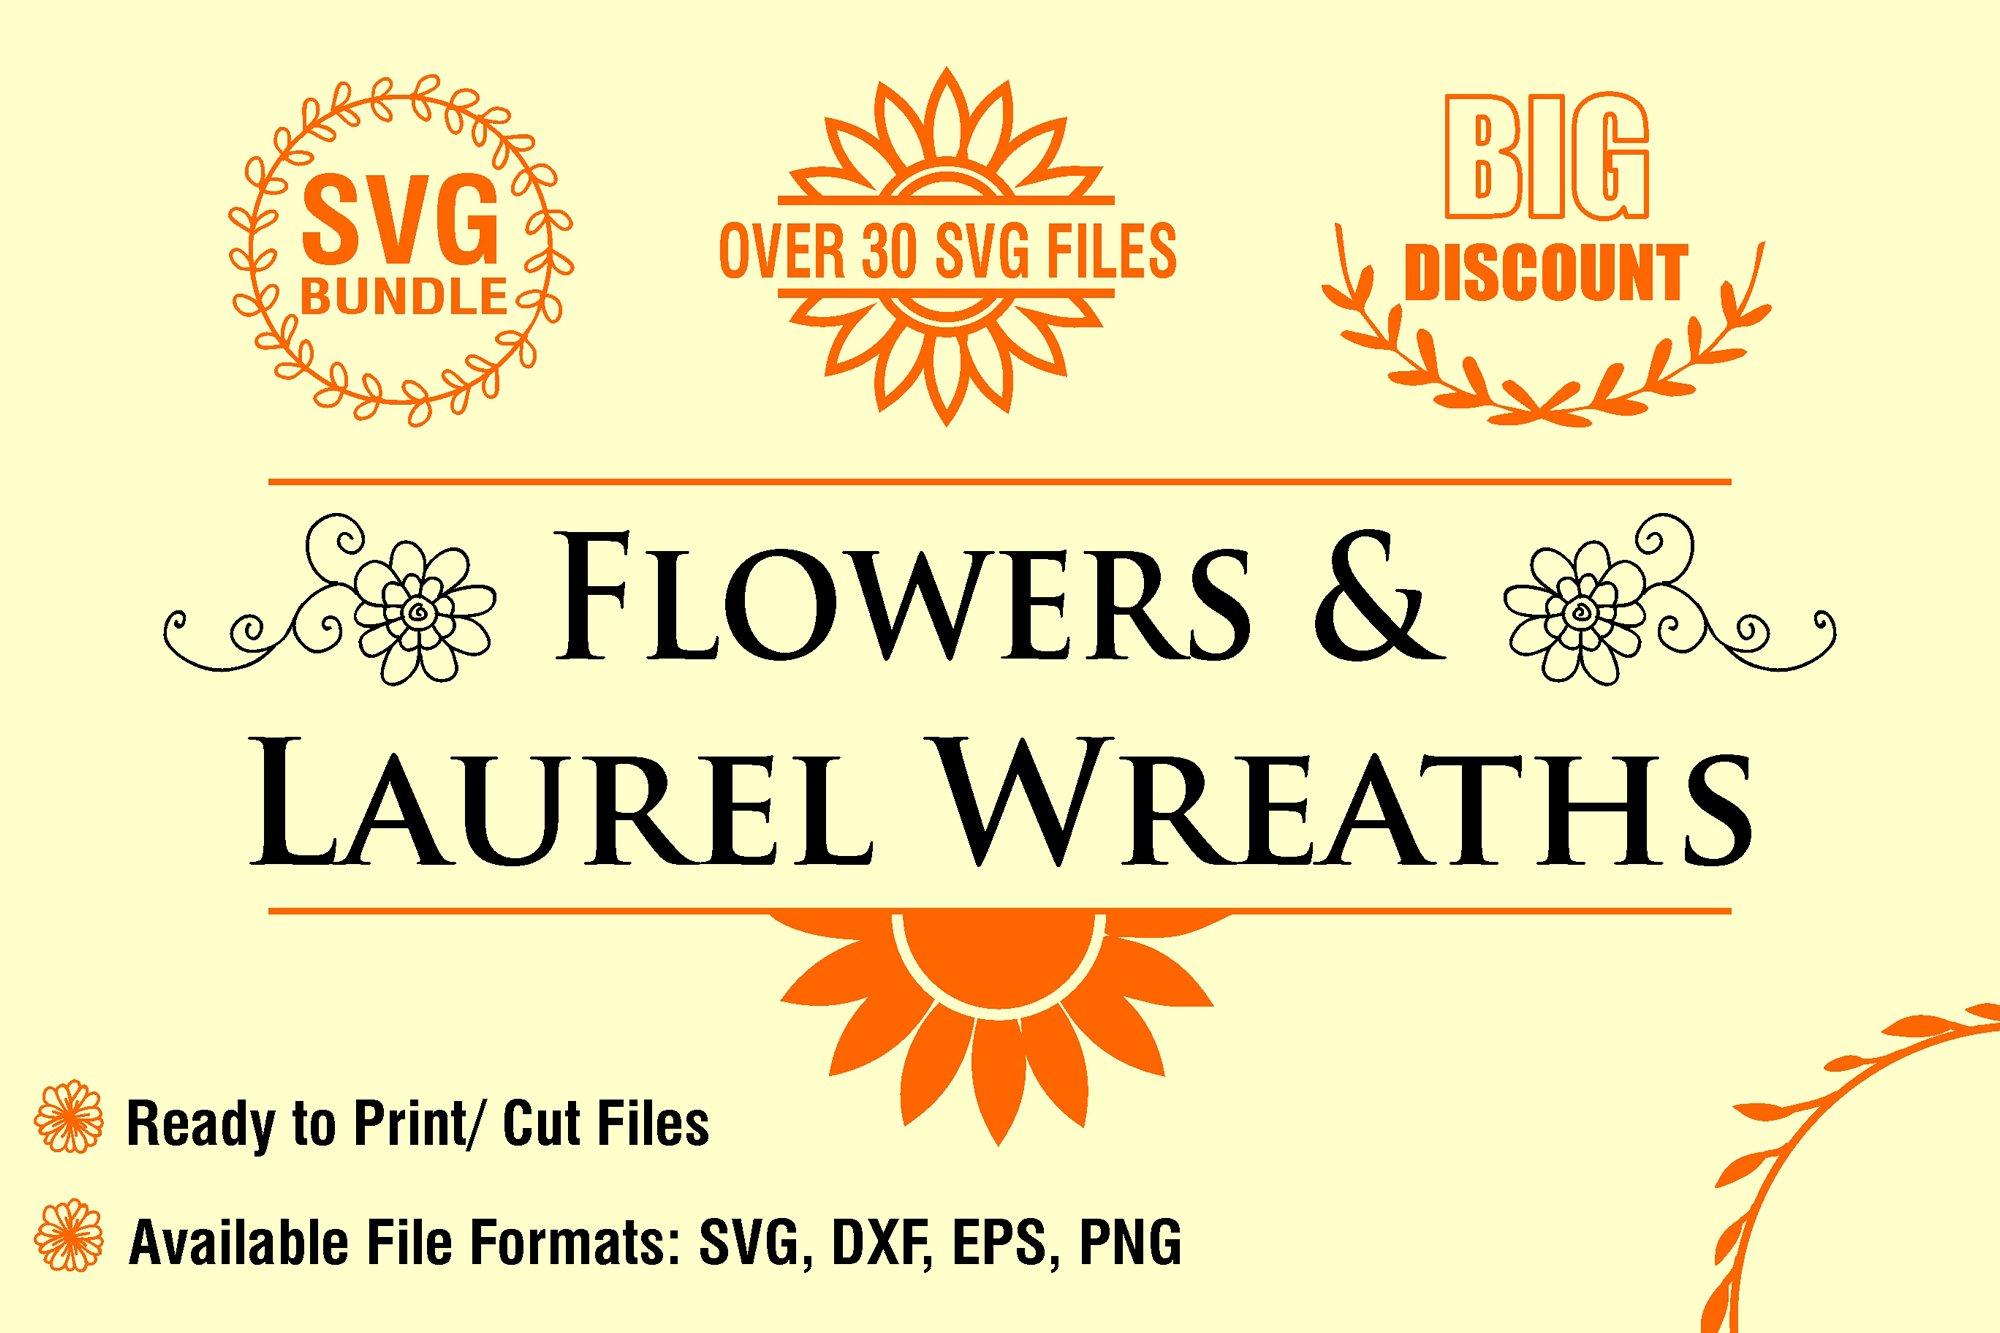 Flowers and Laurel Wreaths SVG Bundle example image 1